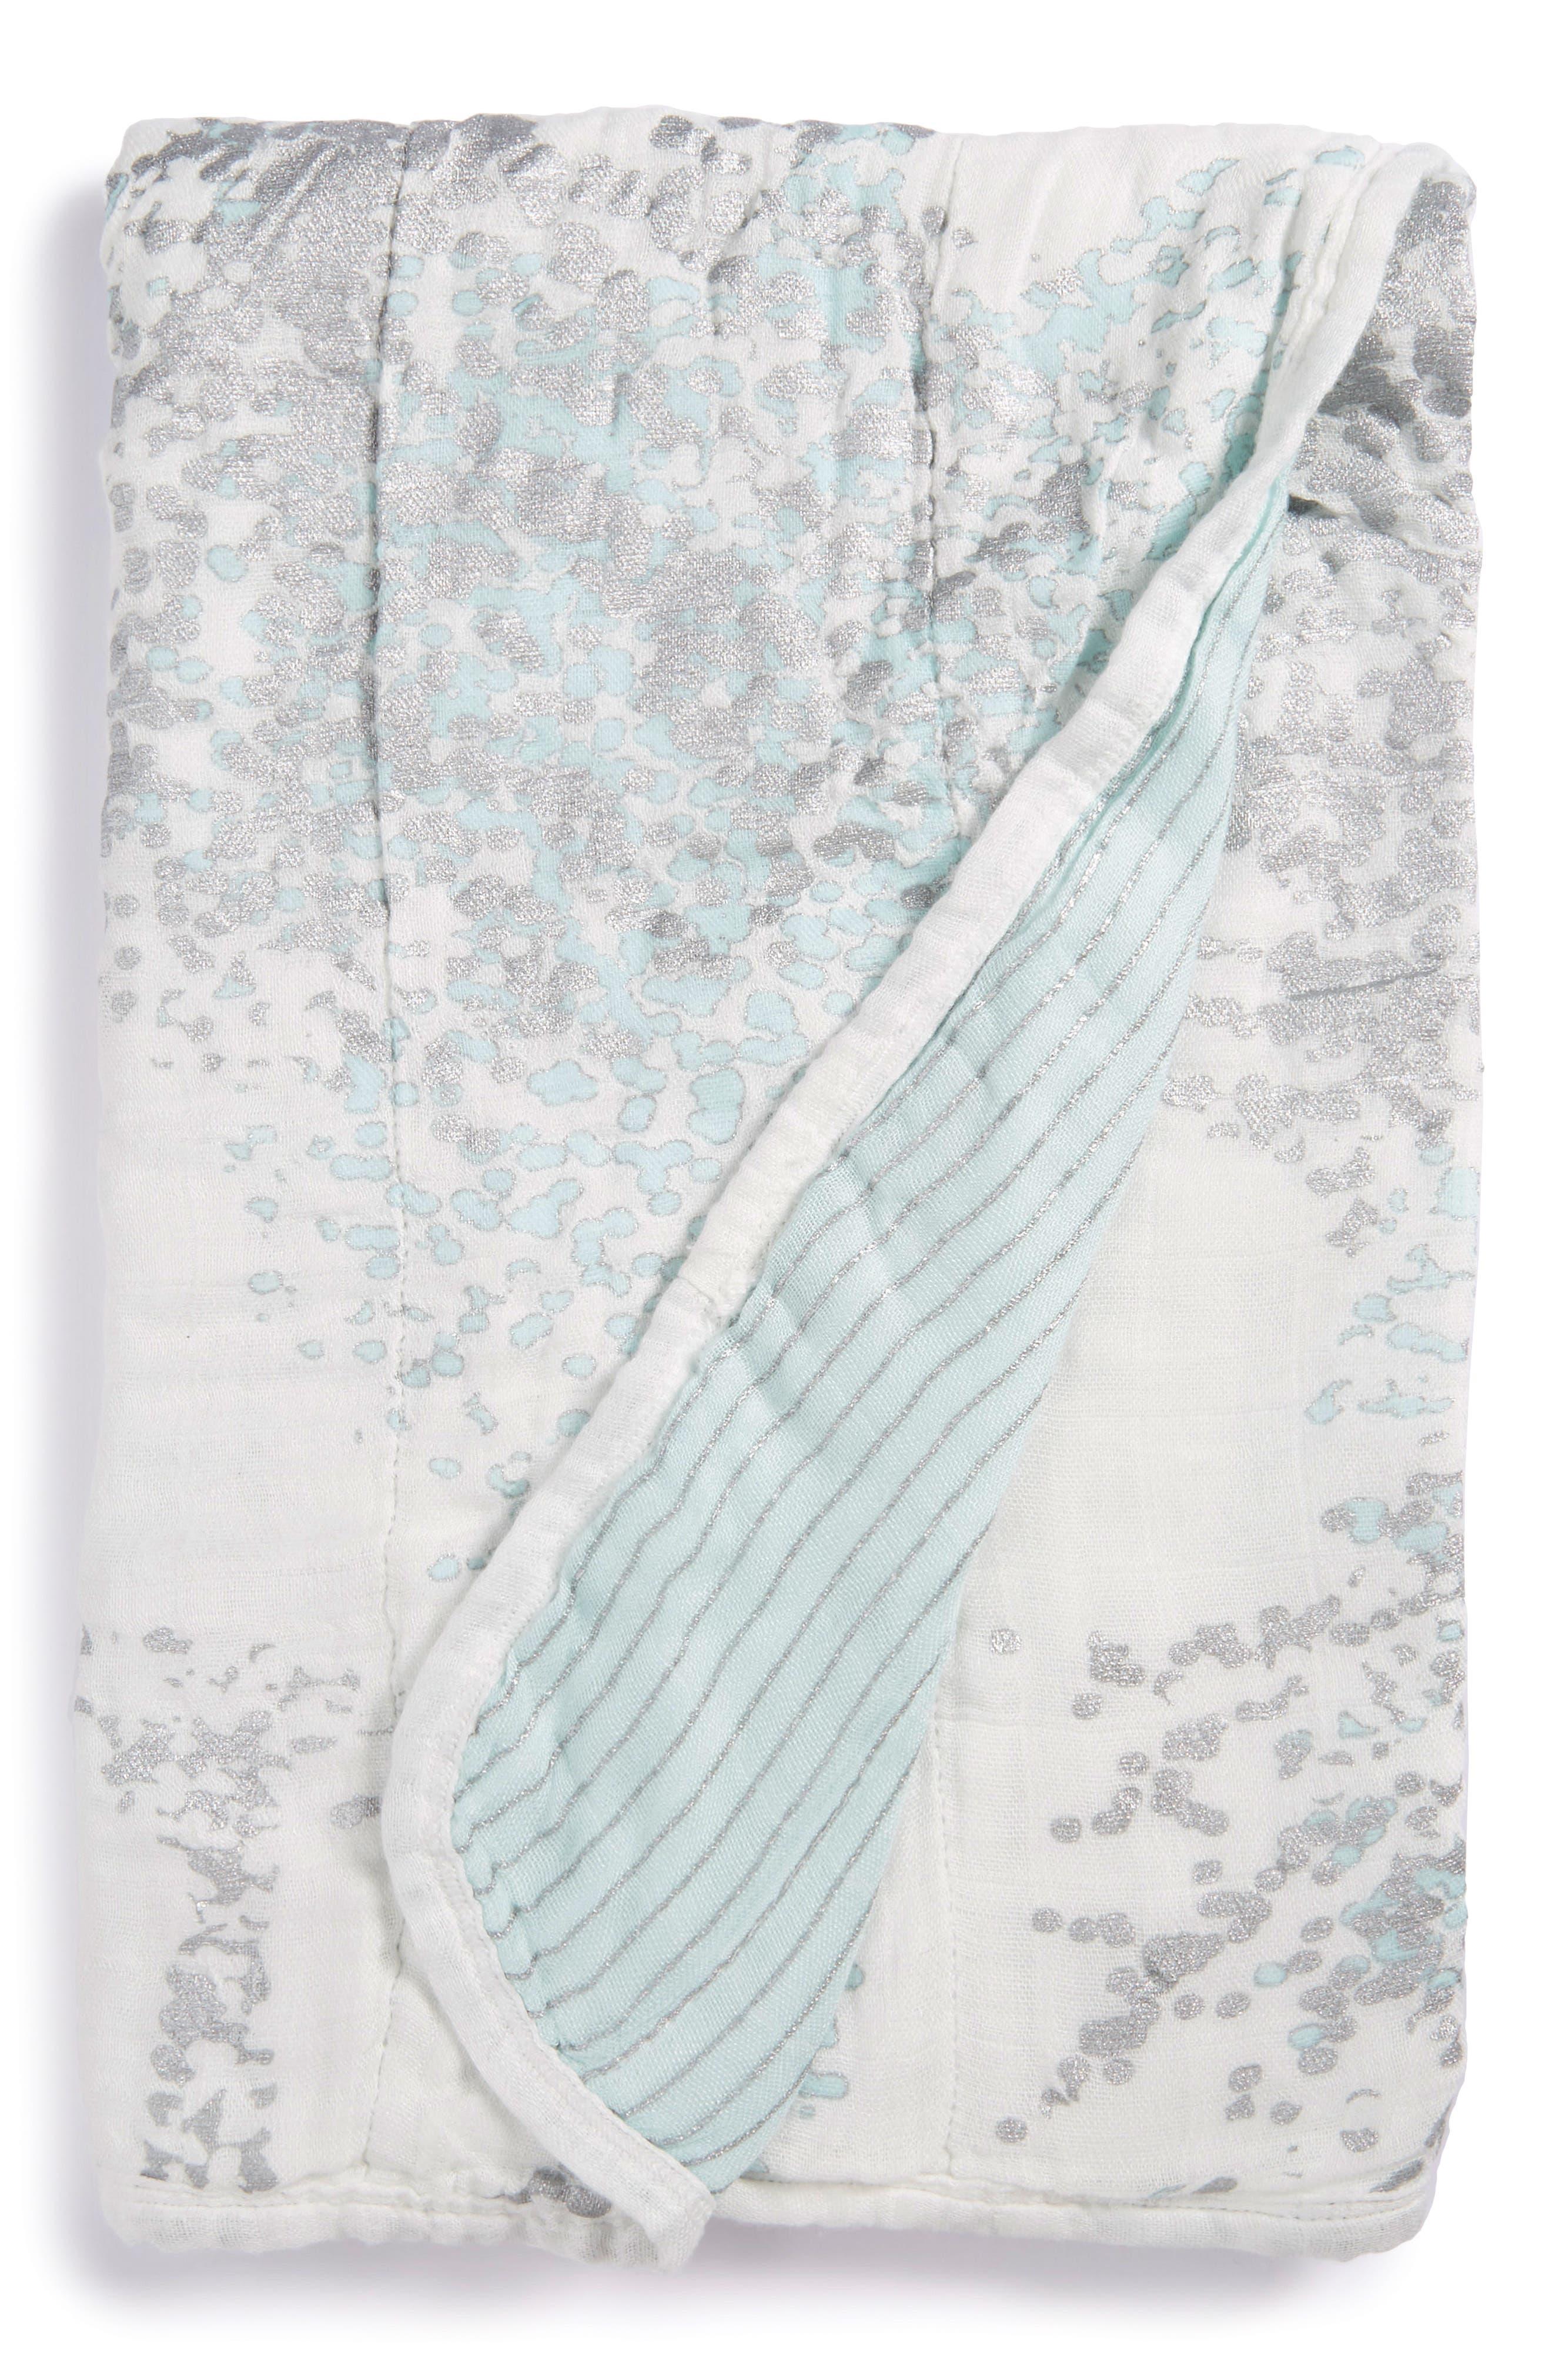 Alternate Image 1 Selected - aden + anais Silky Soft Stroller Blanket